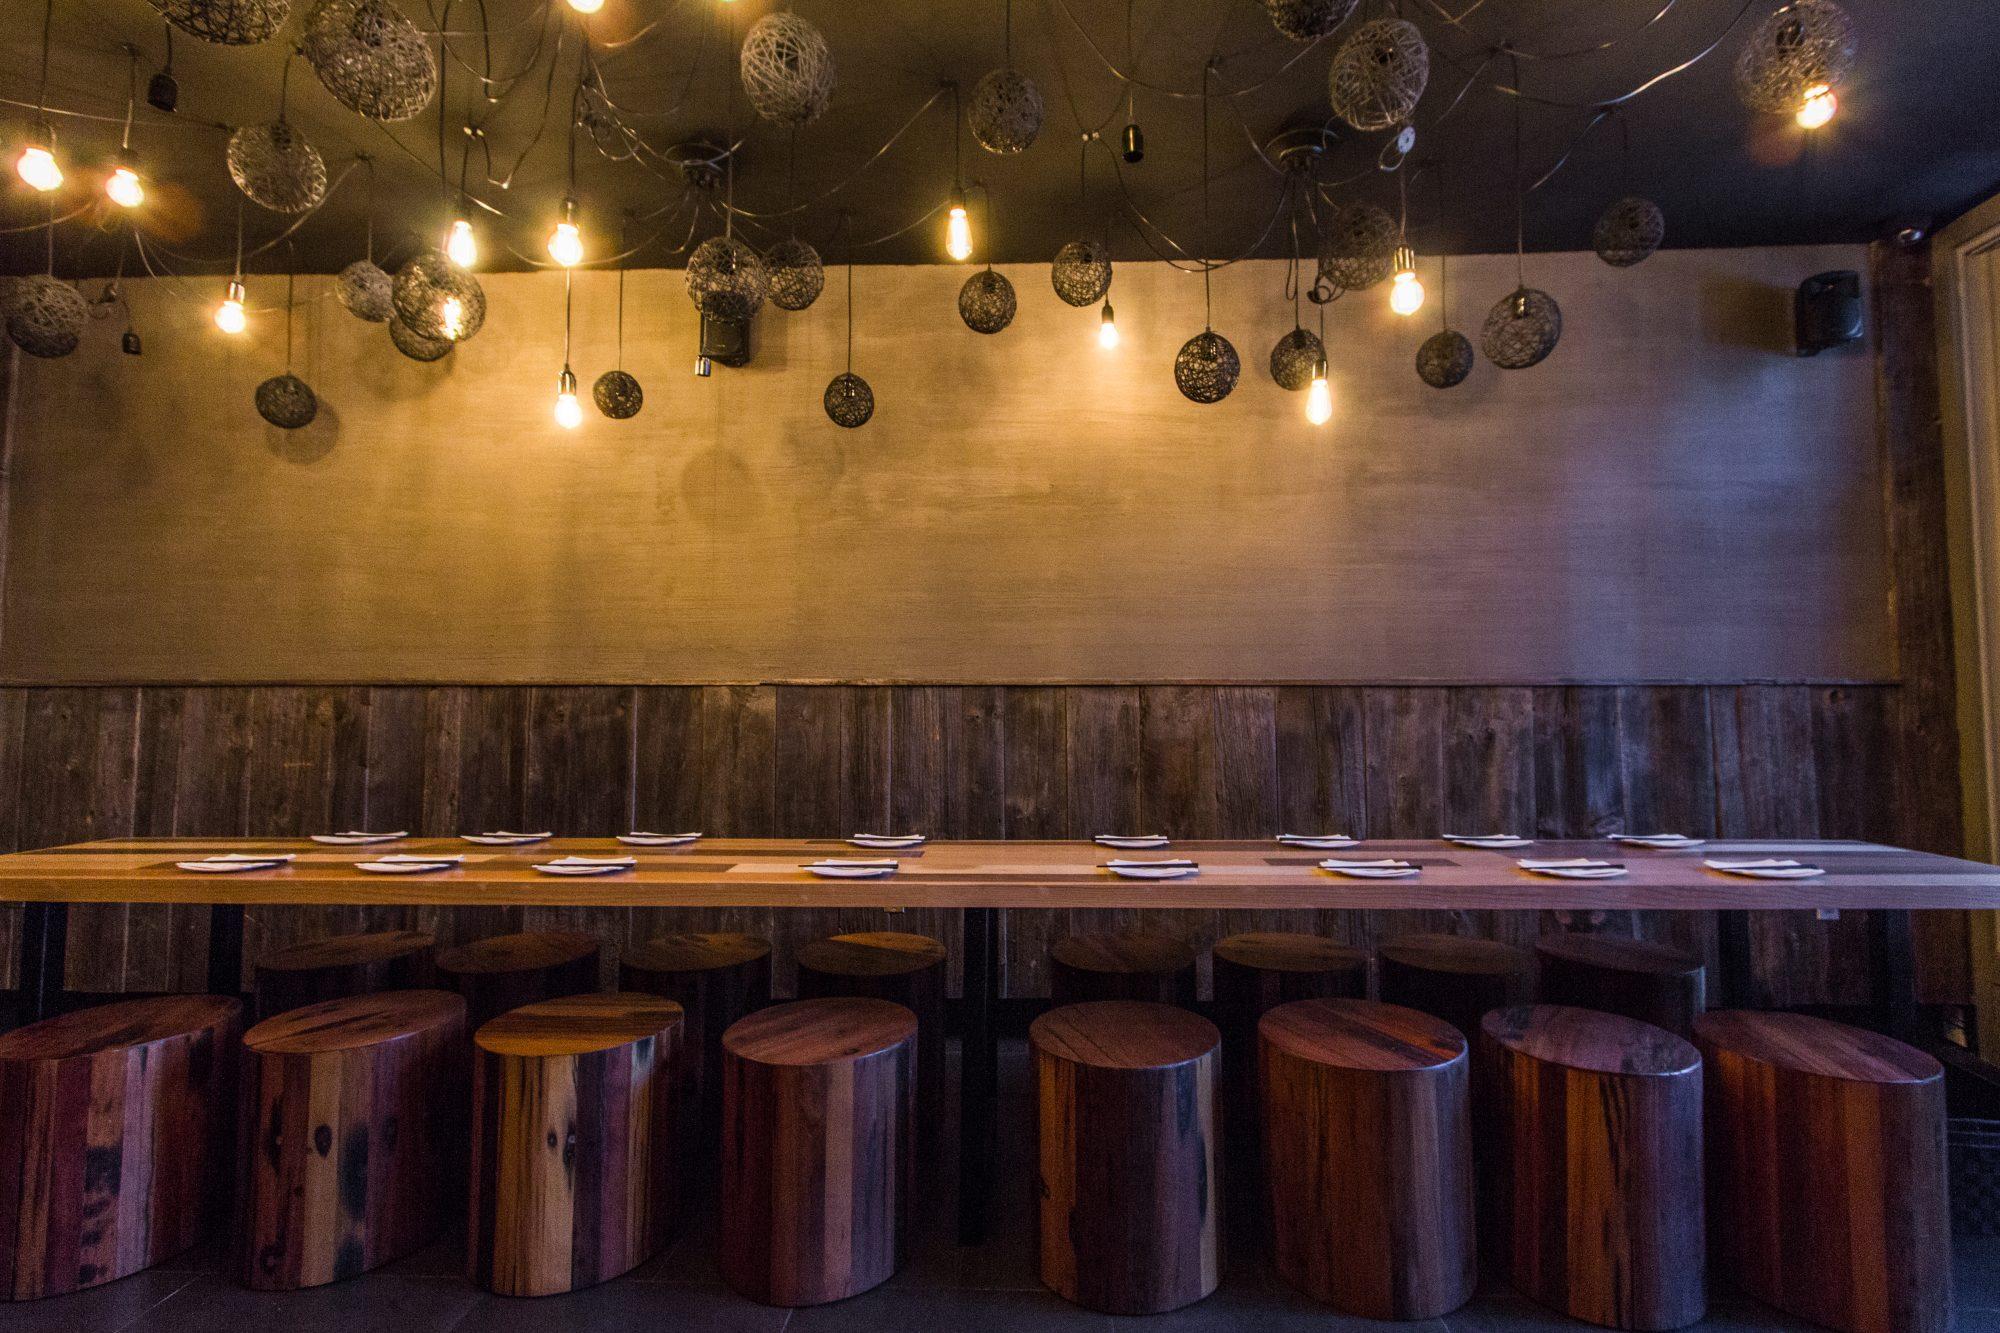 toronto-restaurants-guu-izakaya-parkdale-japanase-parkdale-tables